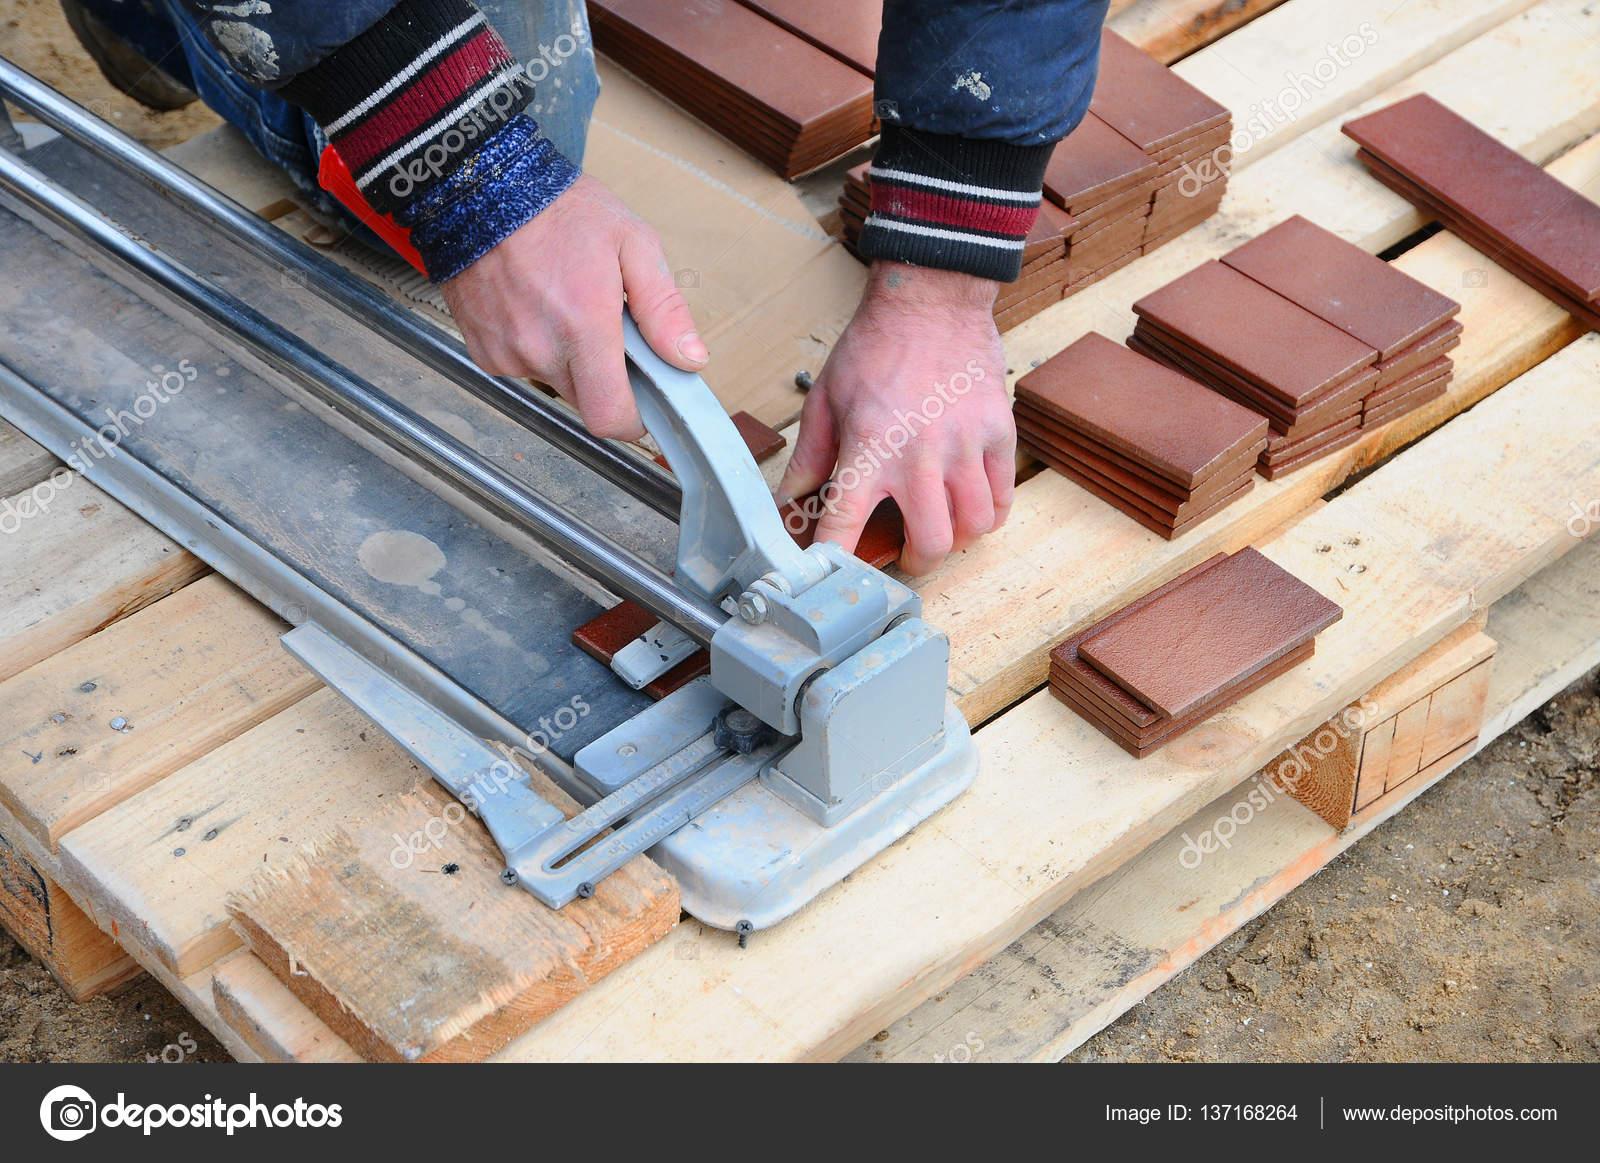 Operaio edile piastrellista taglia piastrelle piastrelle. lavorando